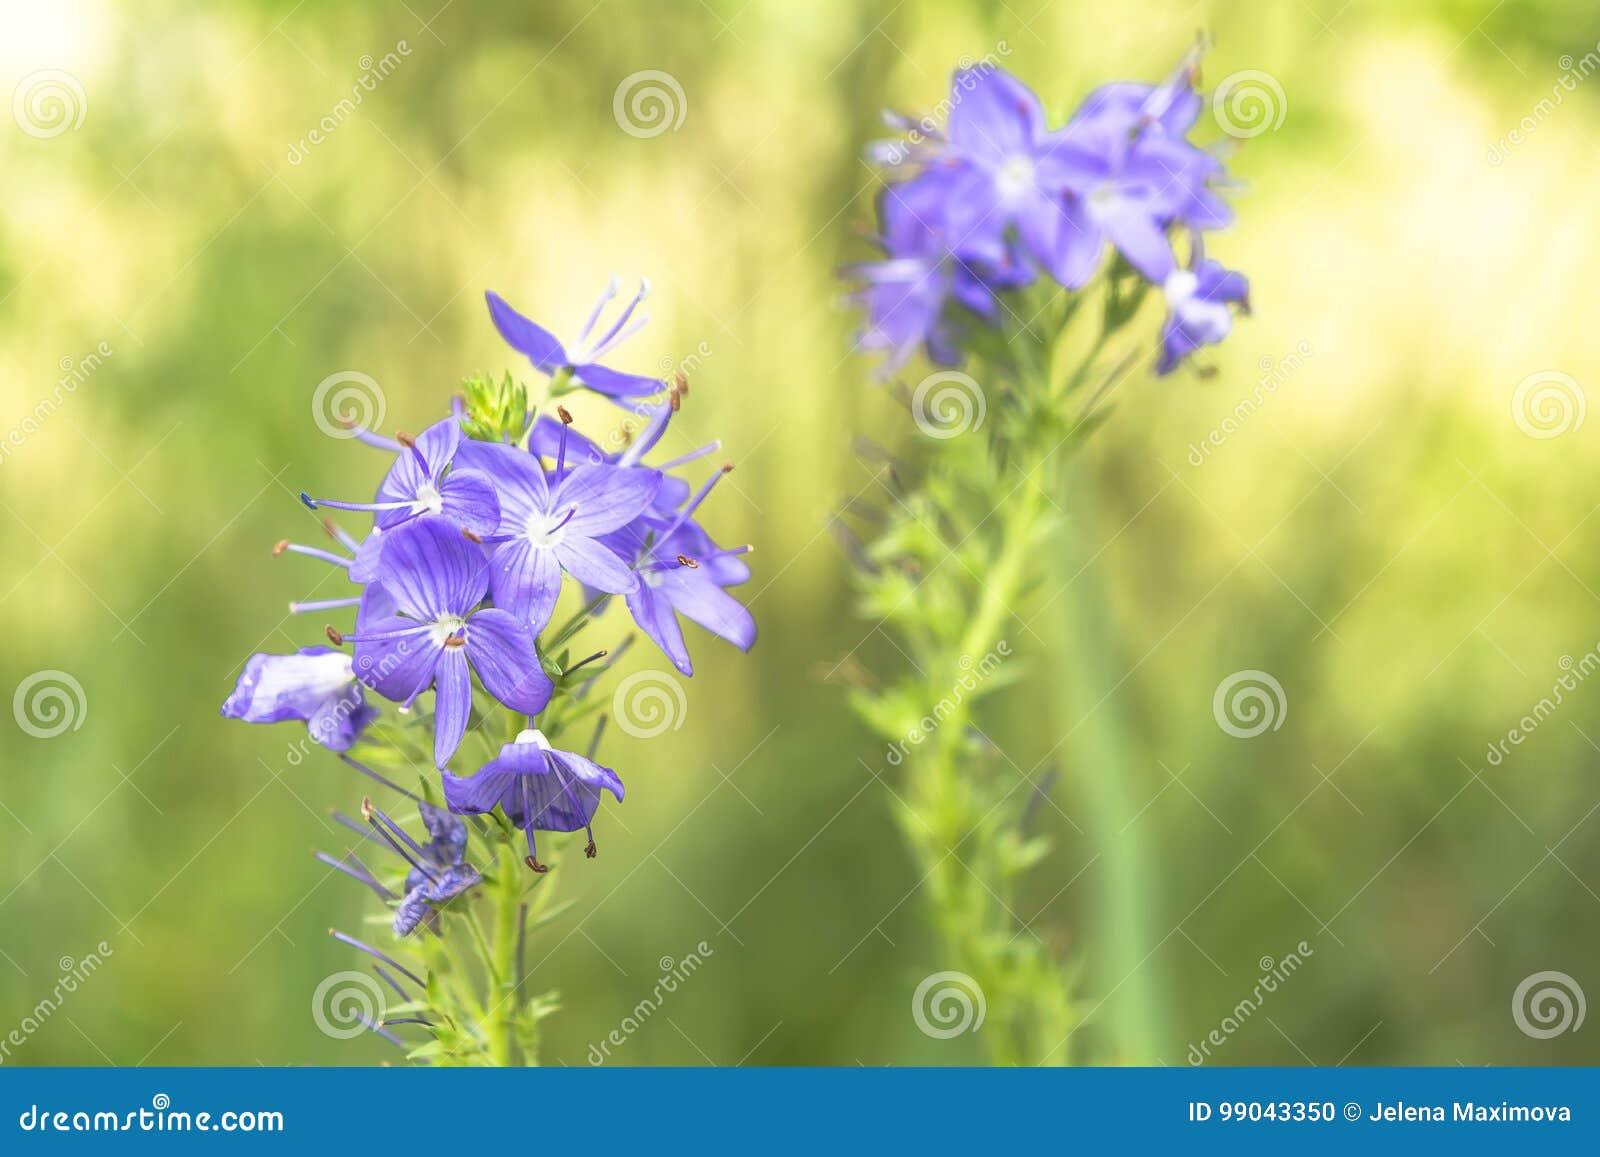 Blue flowers stock photo image of season macro blue 99043350 blue flowers izmirmasajfo